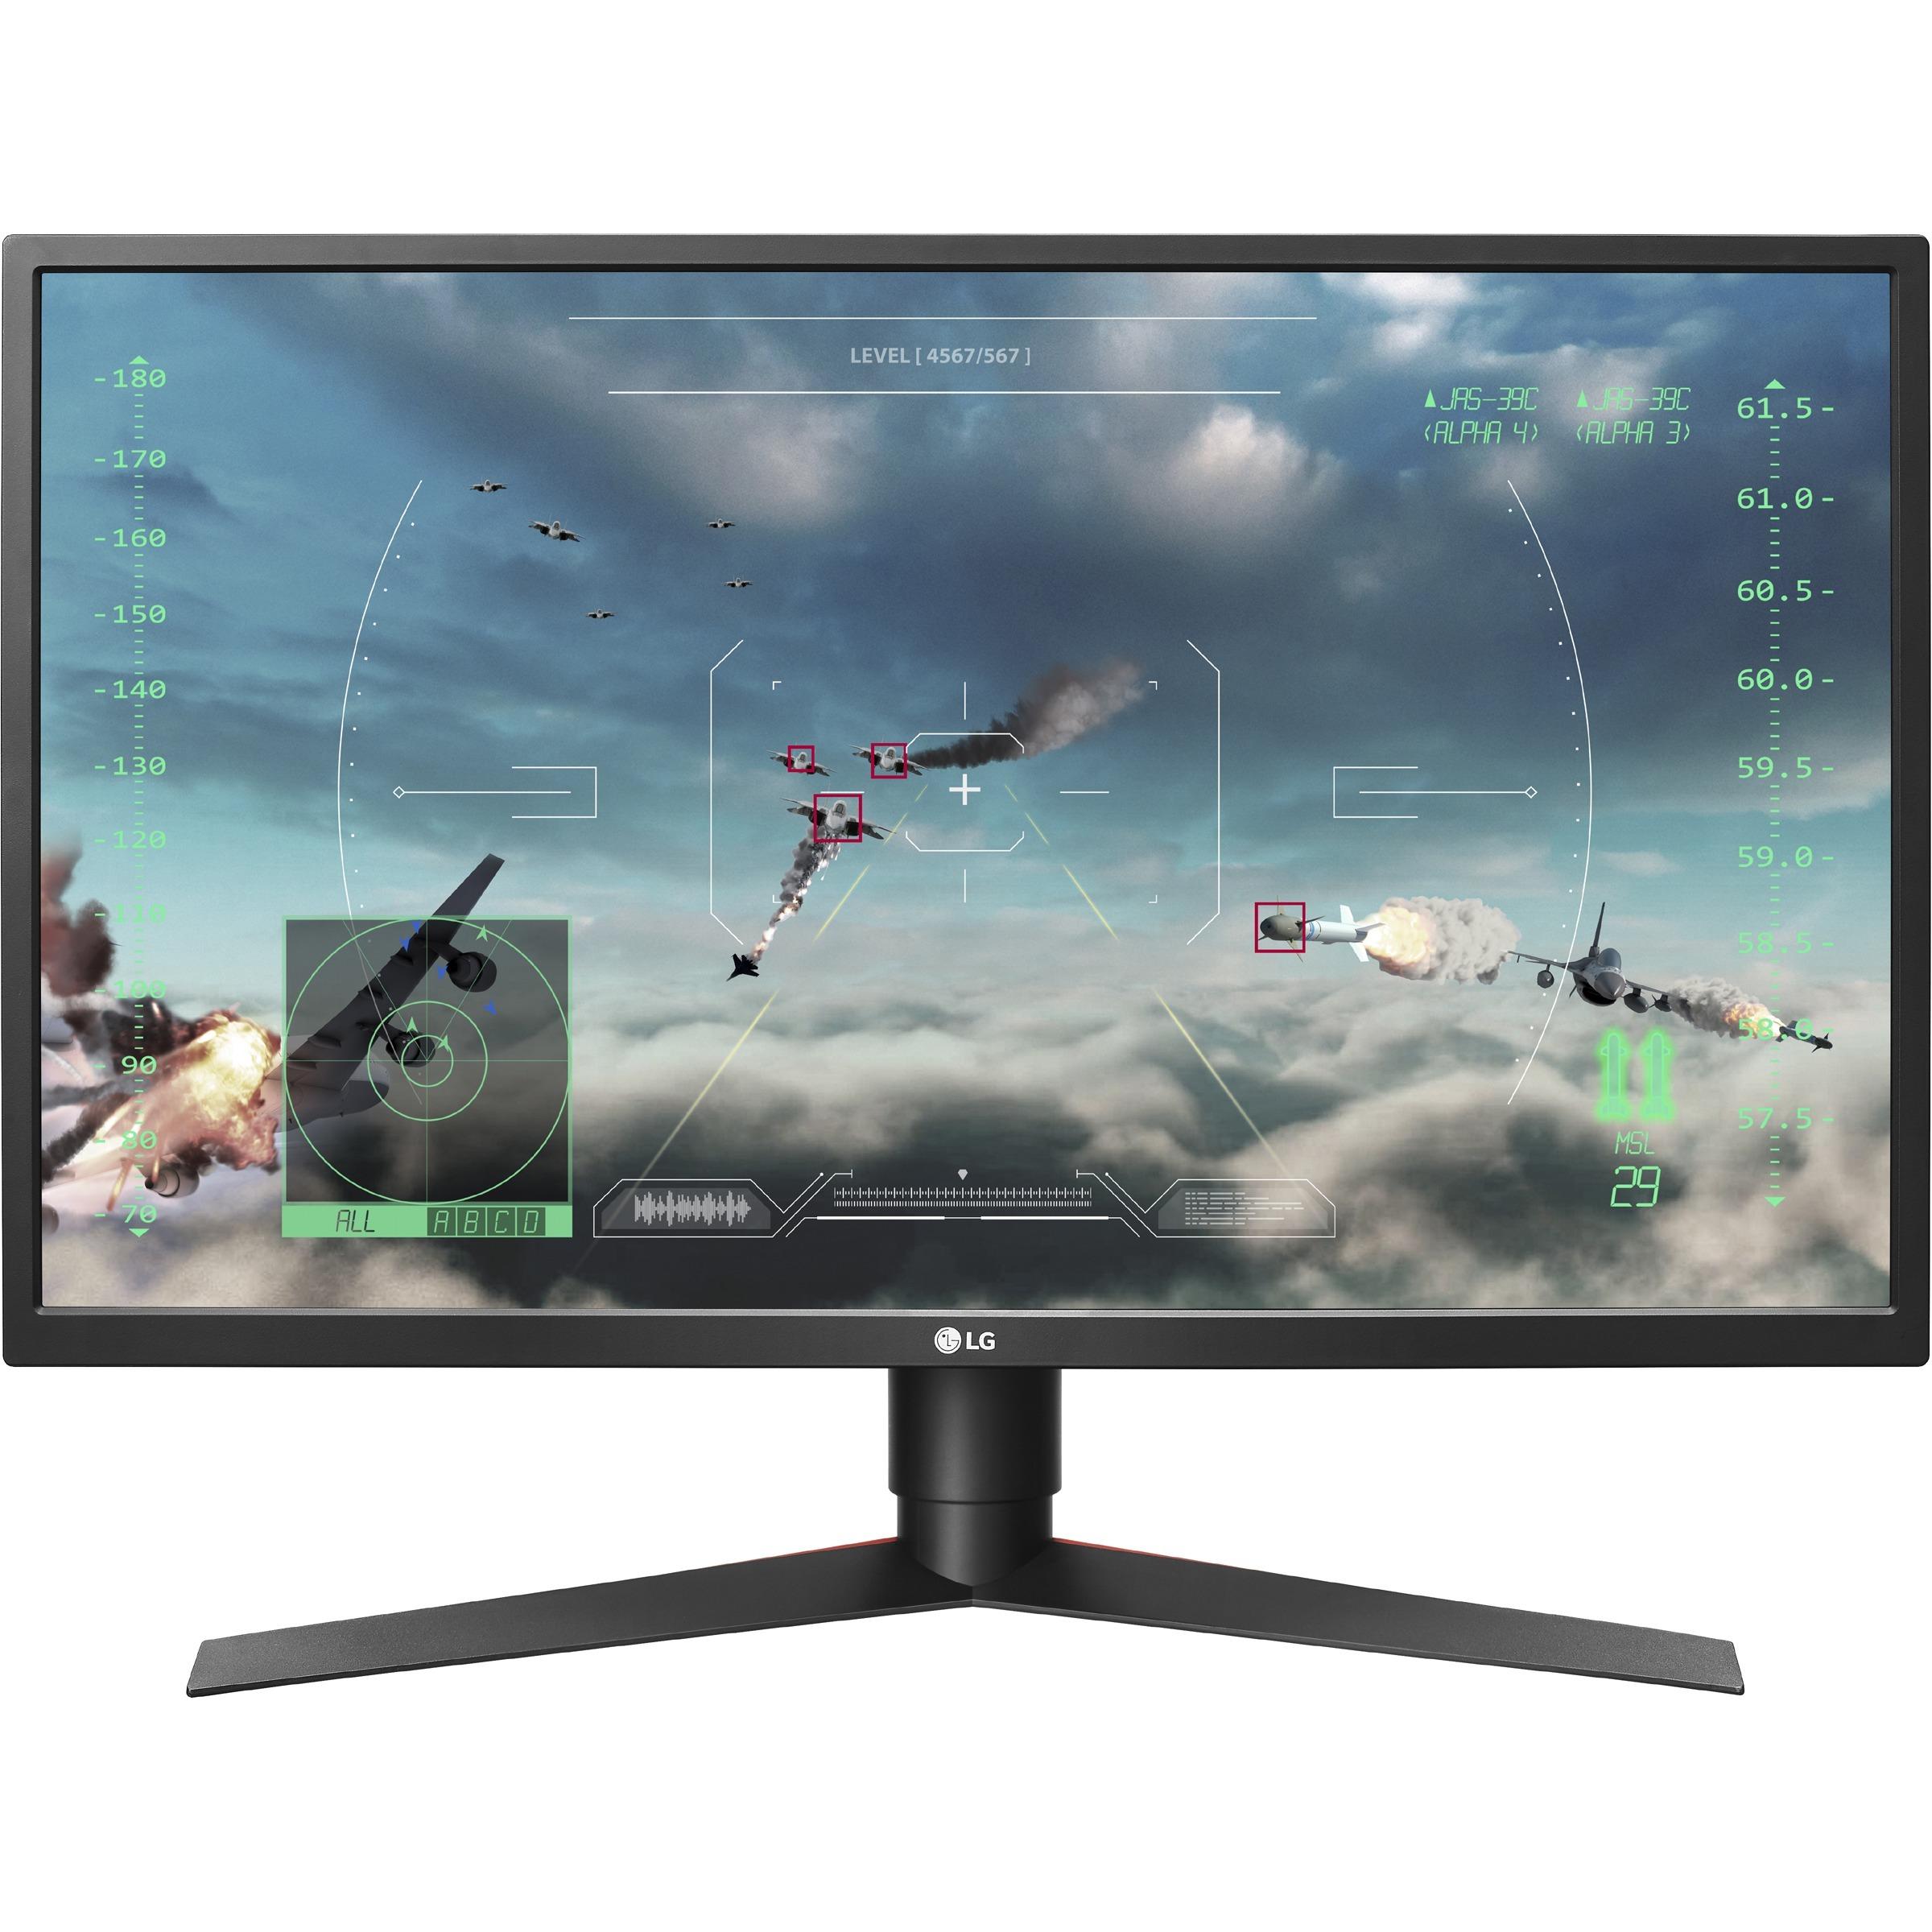 LG 27GK750F 27inch LED LCD Monitor  240Hz